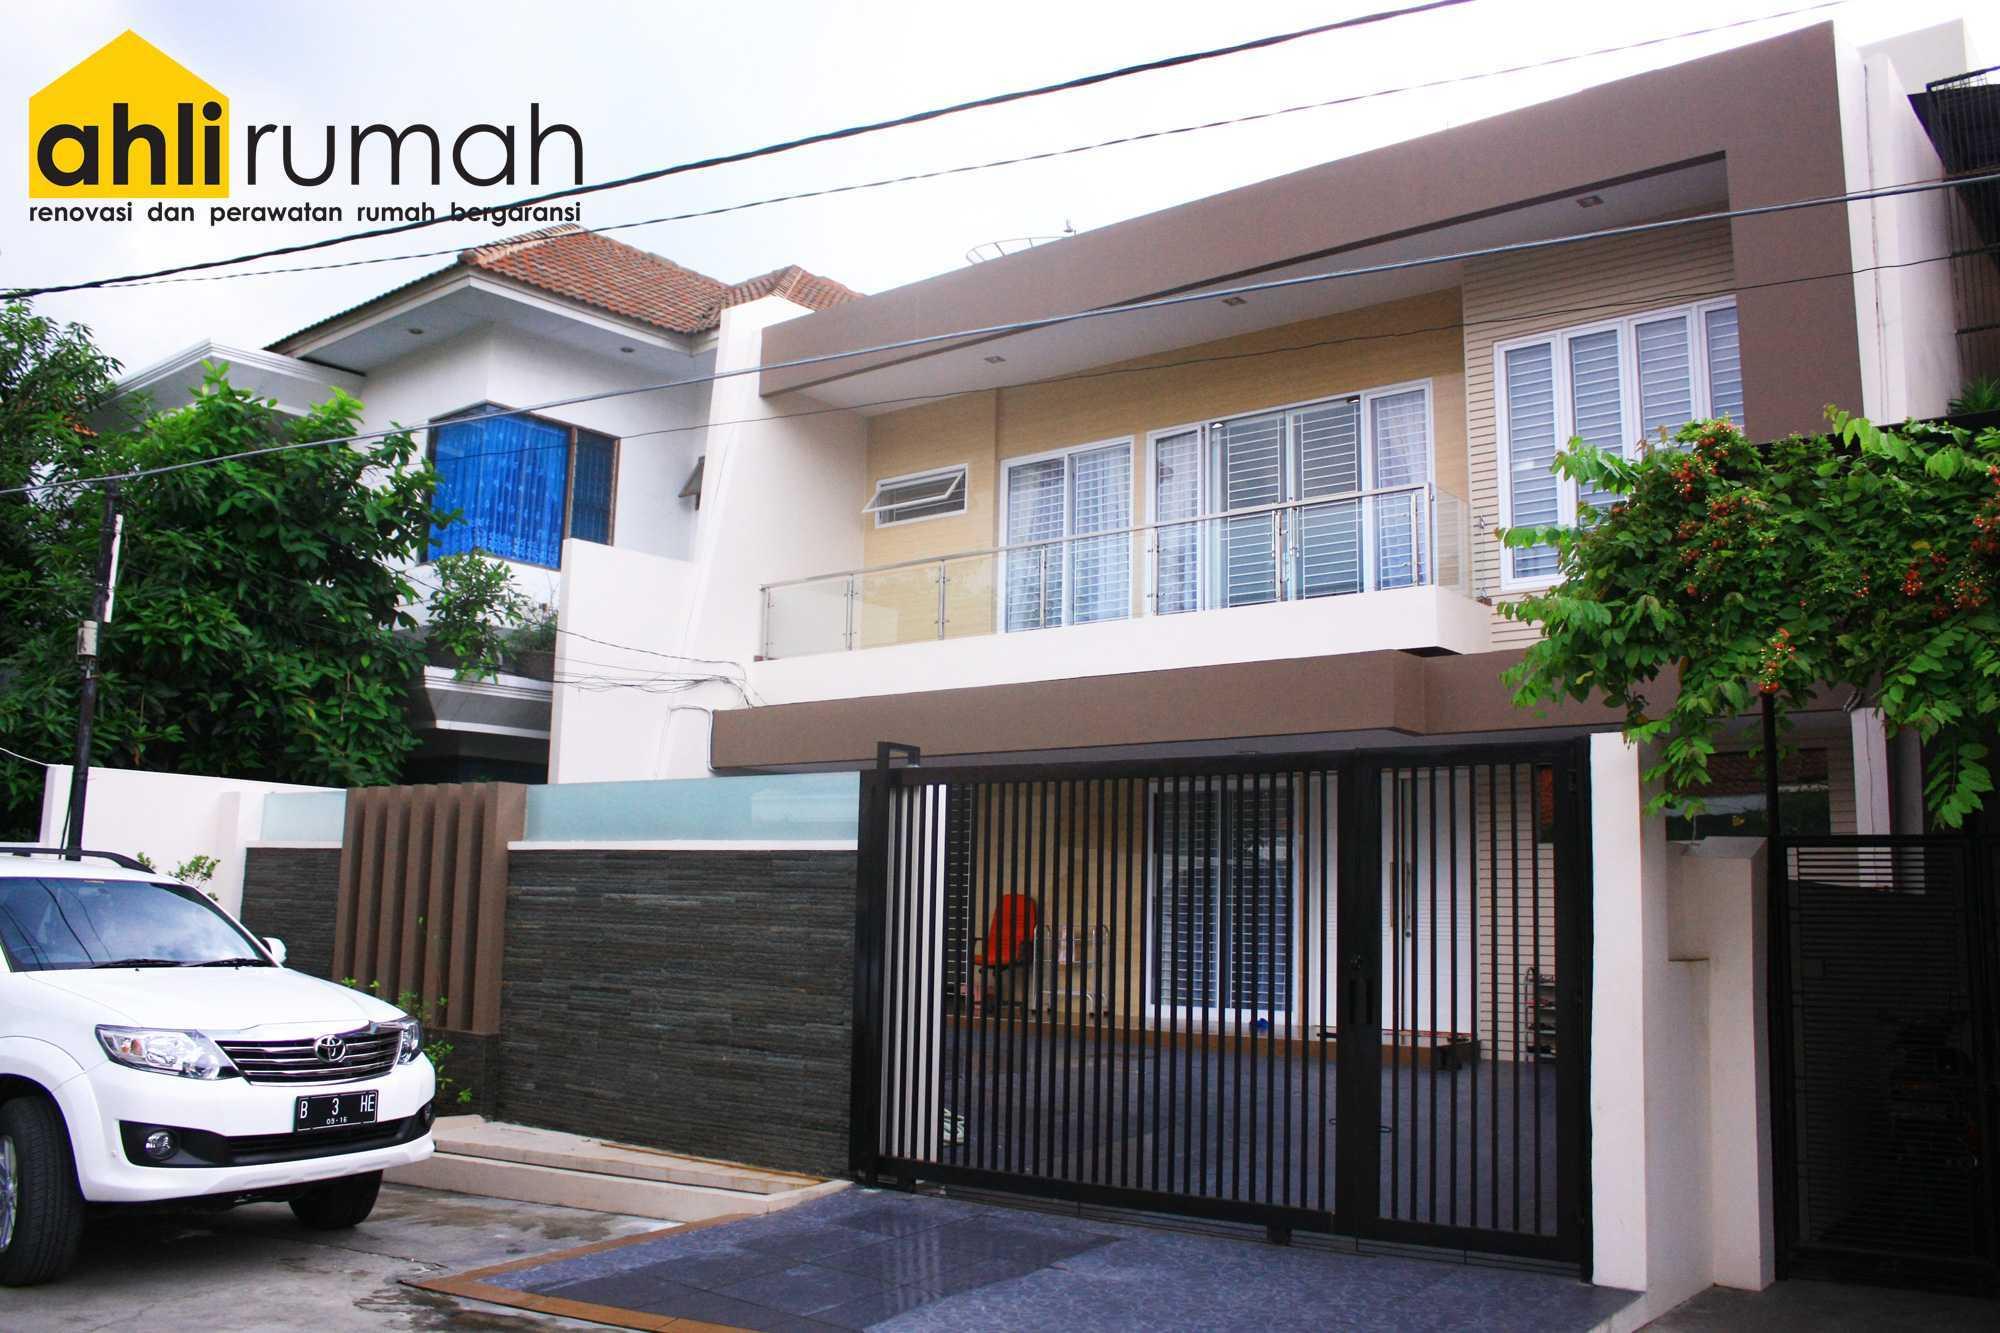 Ahlirumah.id Interior - Rumah Ibu C Daerah Khusus Ibukota Jakarta, Indonesia  Exterior View Contemporary  49164